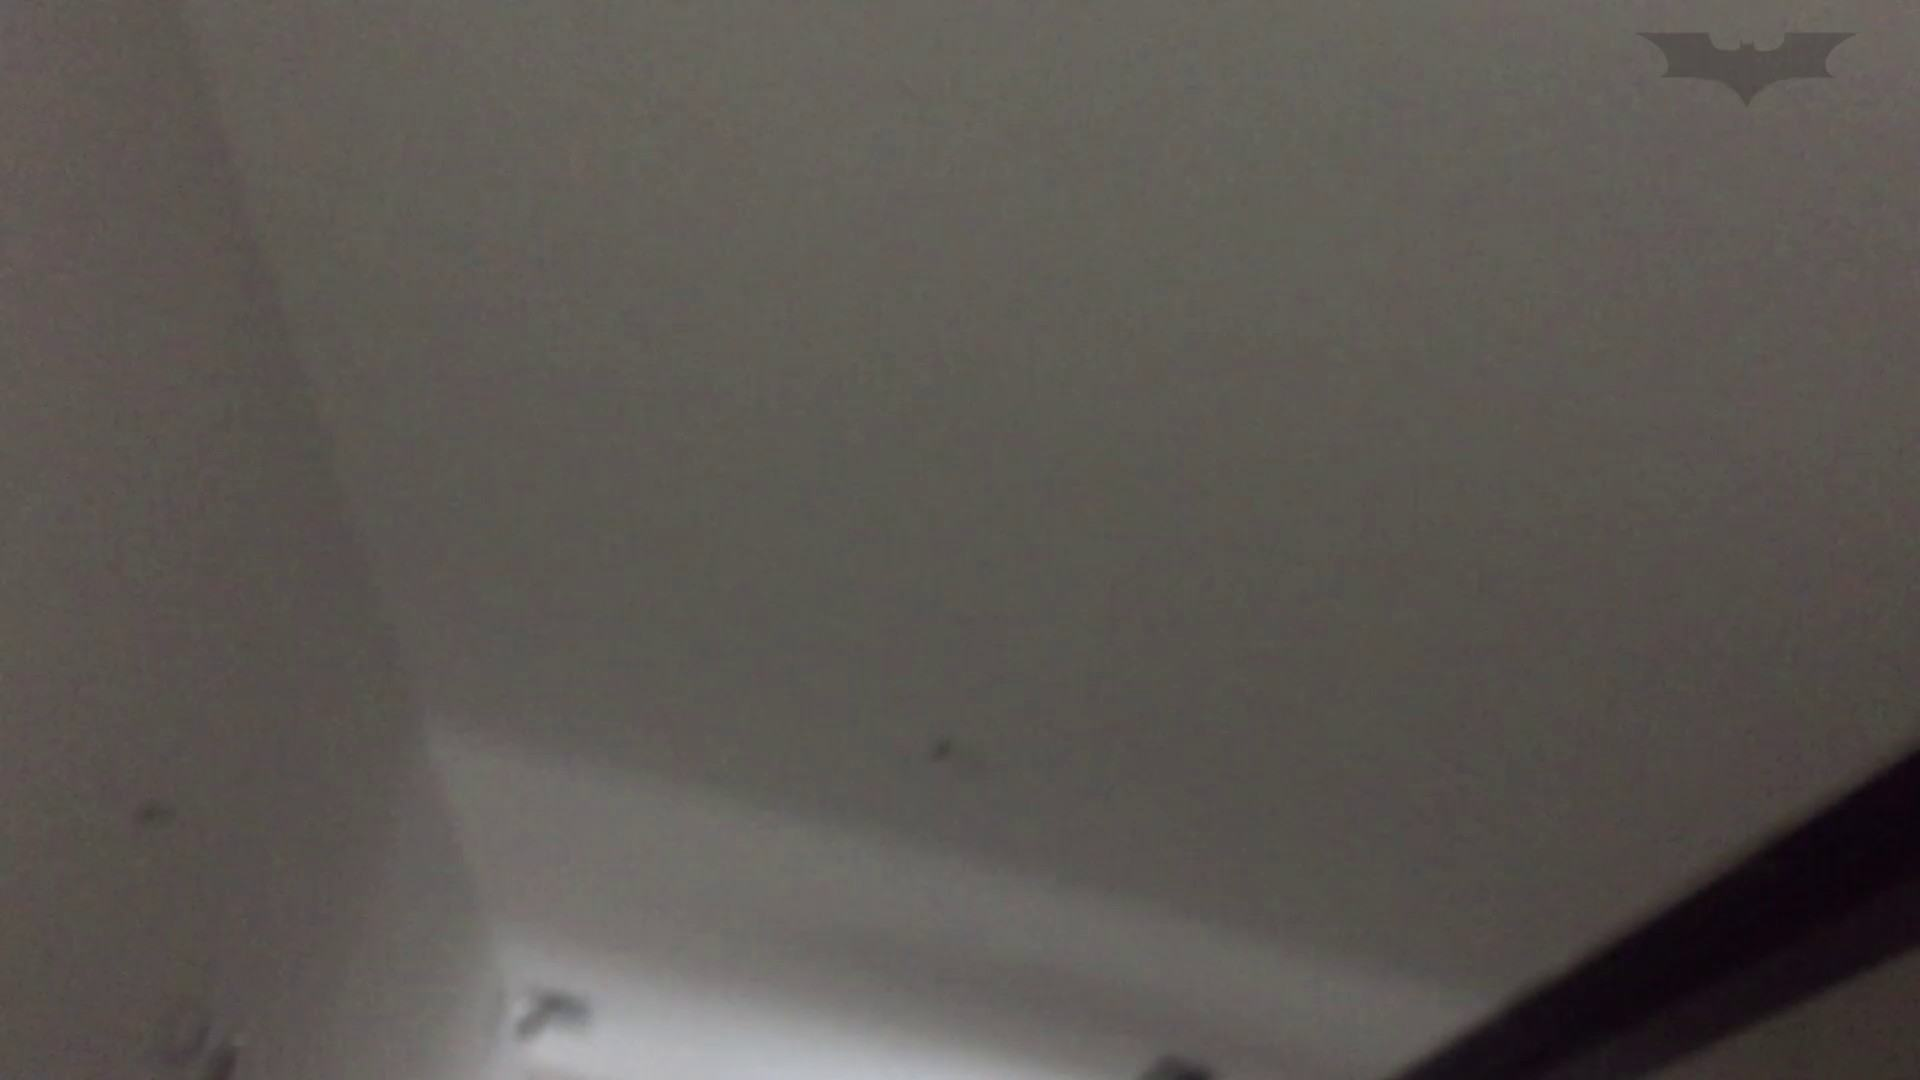 JD盗撮 美女の洗面所の秘密 Vol.74 洗面所 盗撮ワレメ無修正動画無料 91pic 64